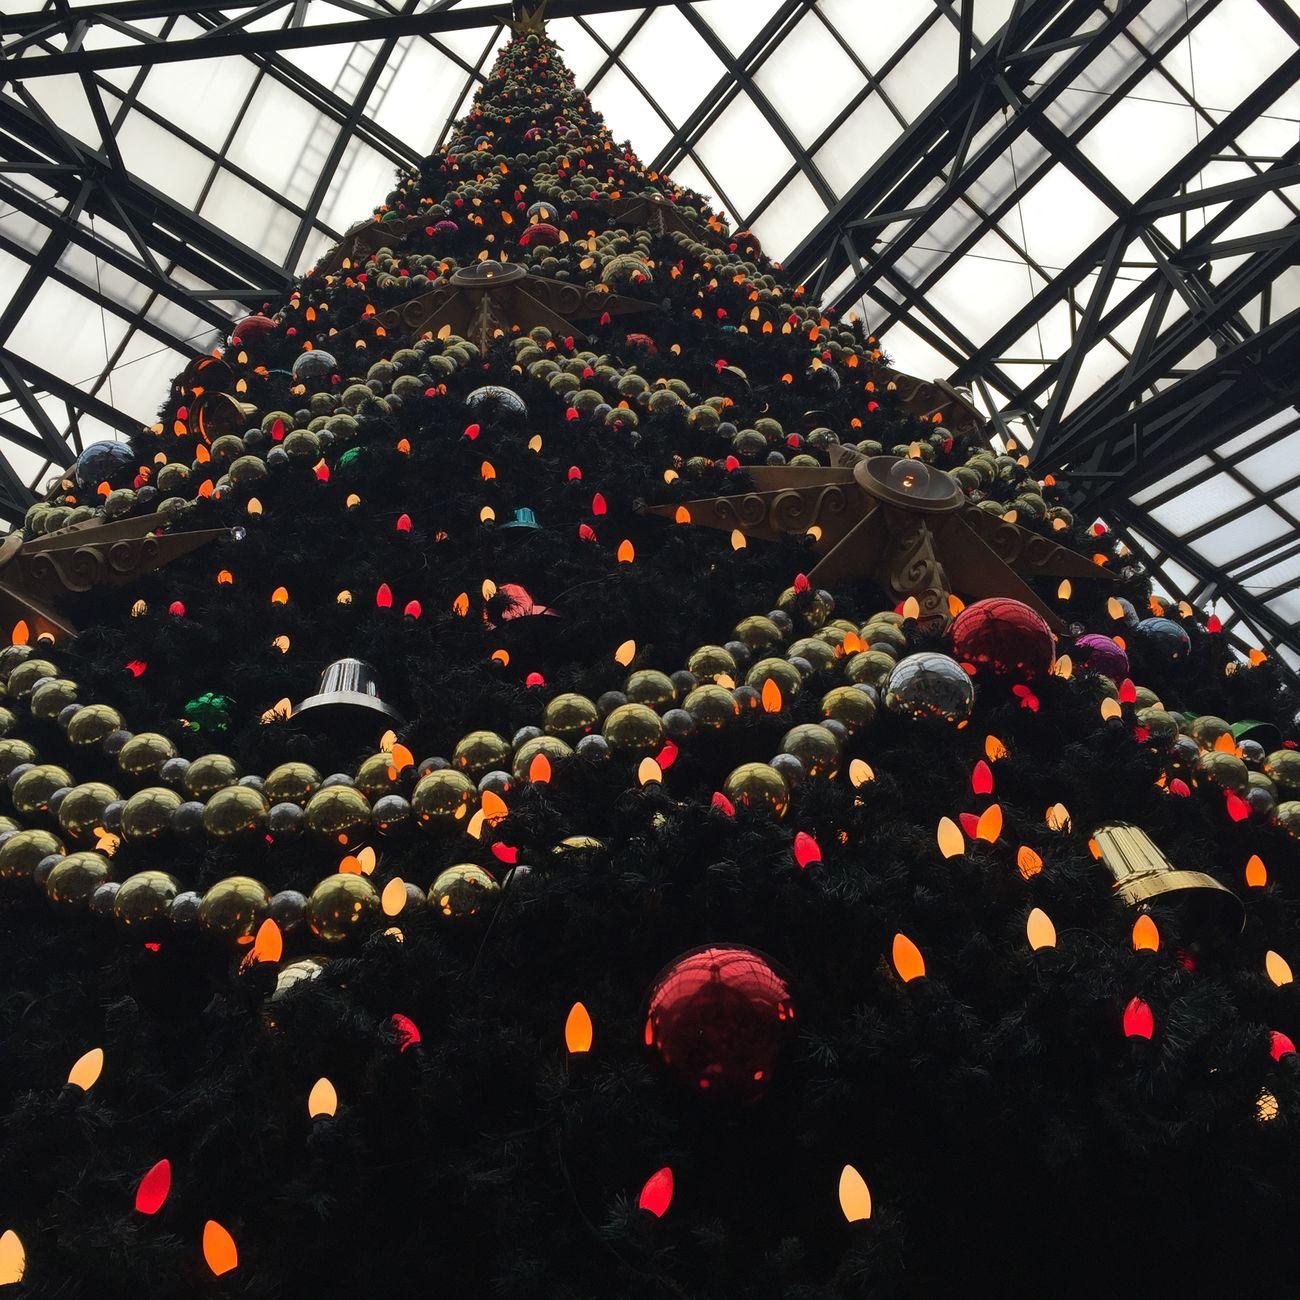 Disneyland Christmas Tree 12.14.